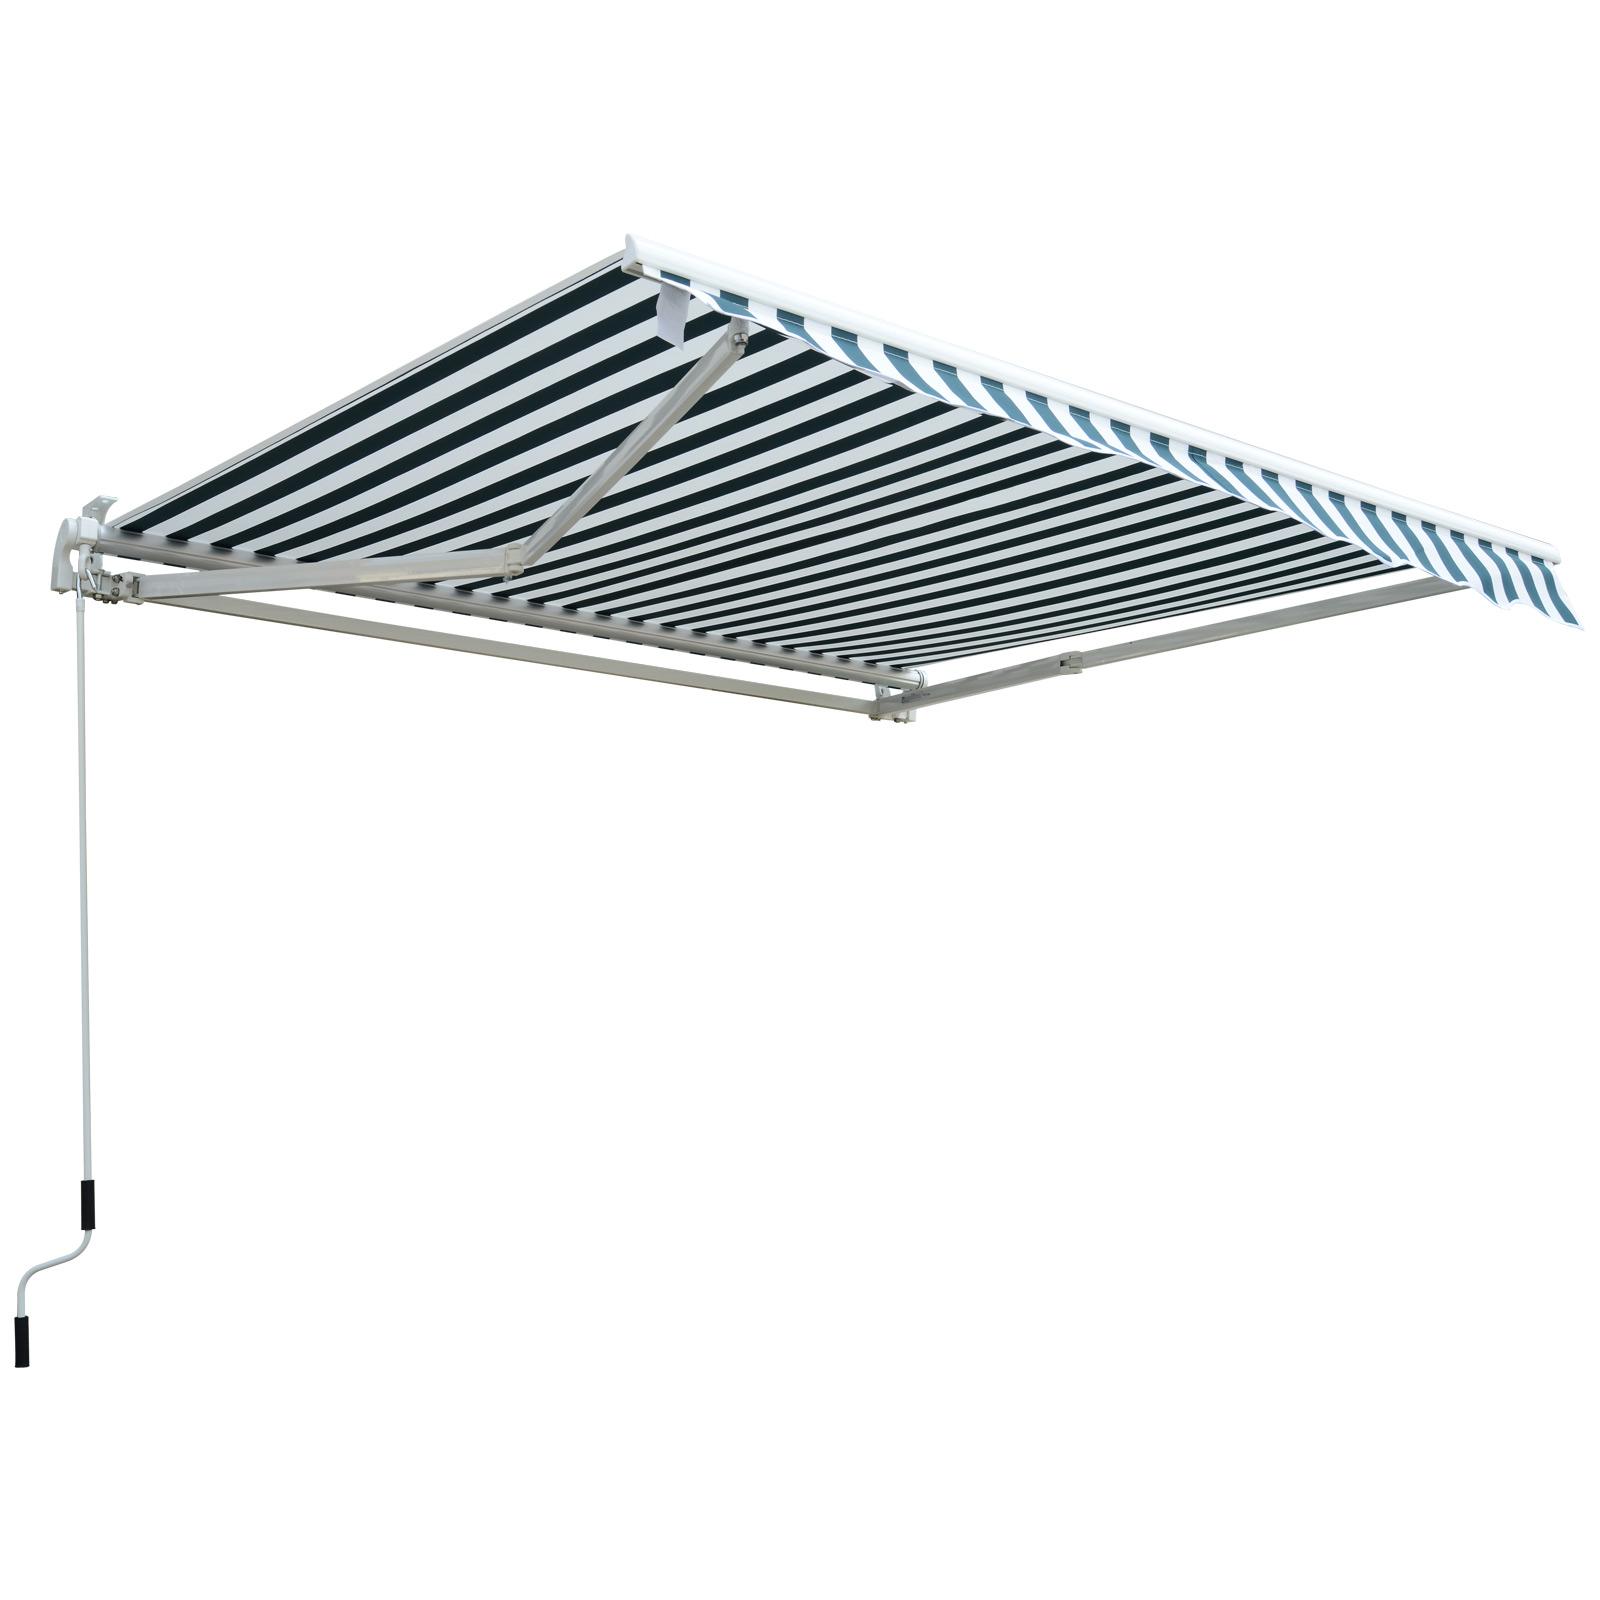 Garden-Patio-Manual-Awning-Canopy-Sun-Shade-Shelter-Retractable-4-Size-5-Colour thumbnail 22